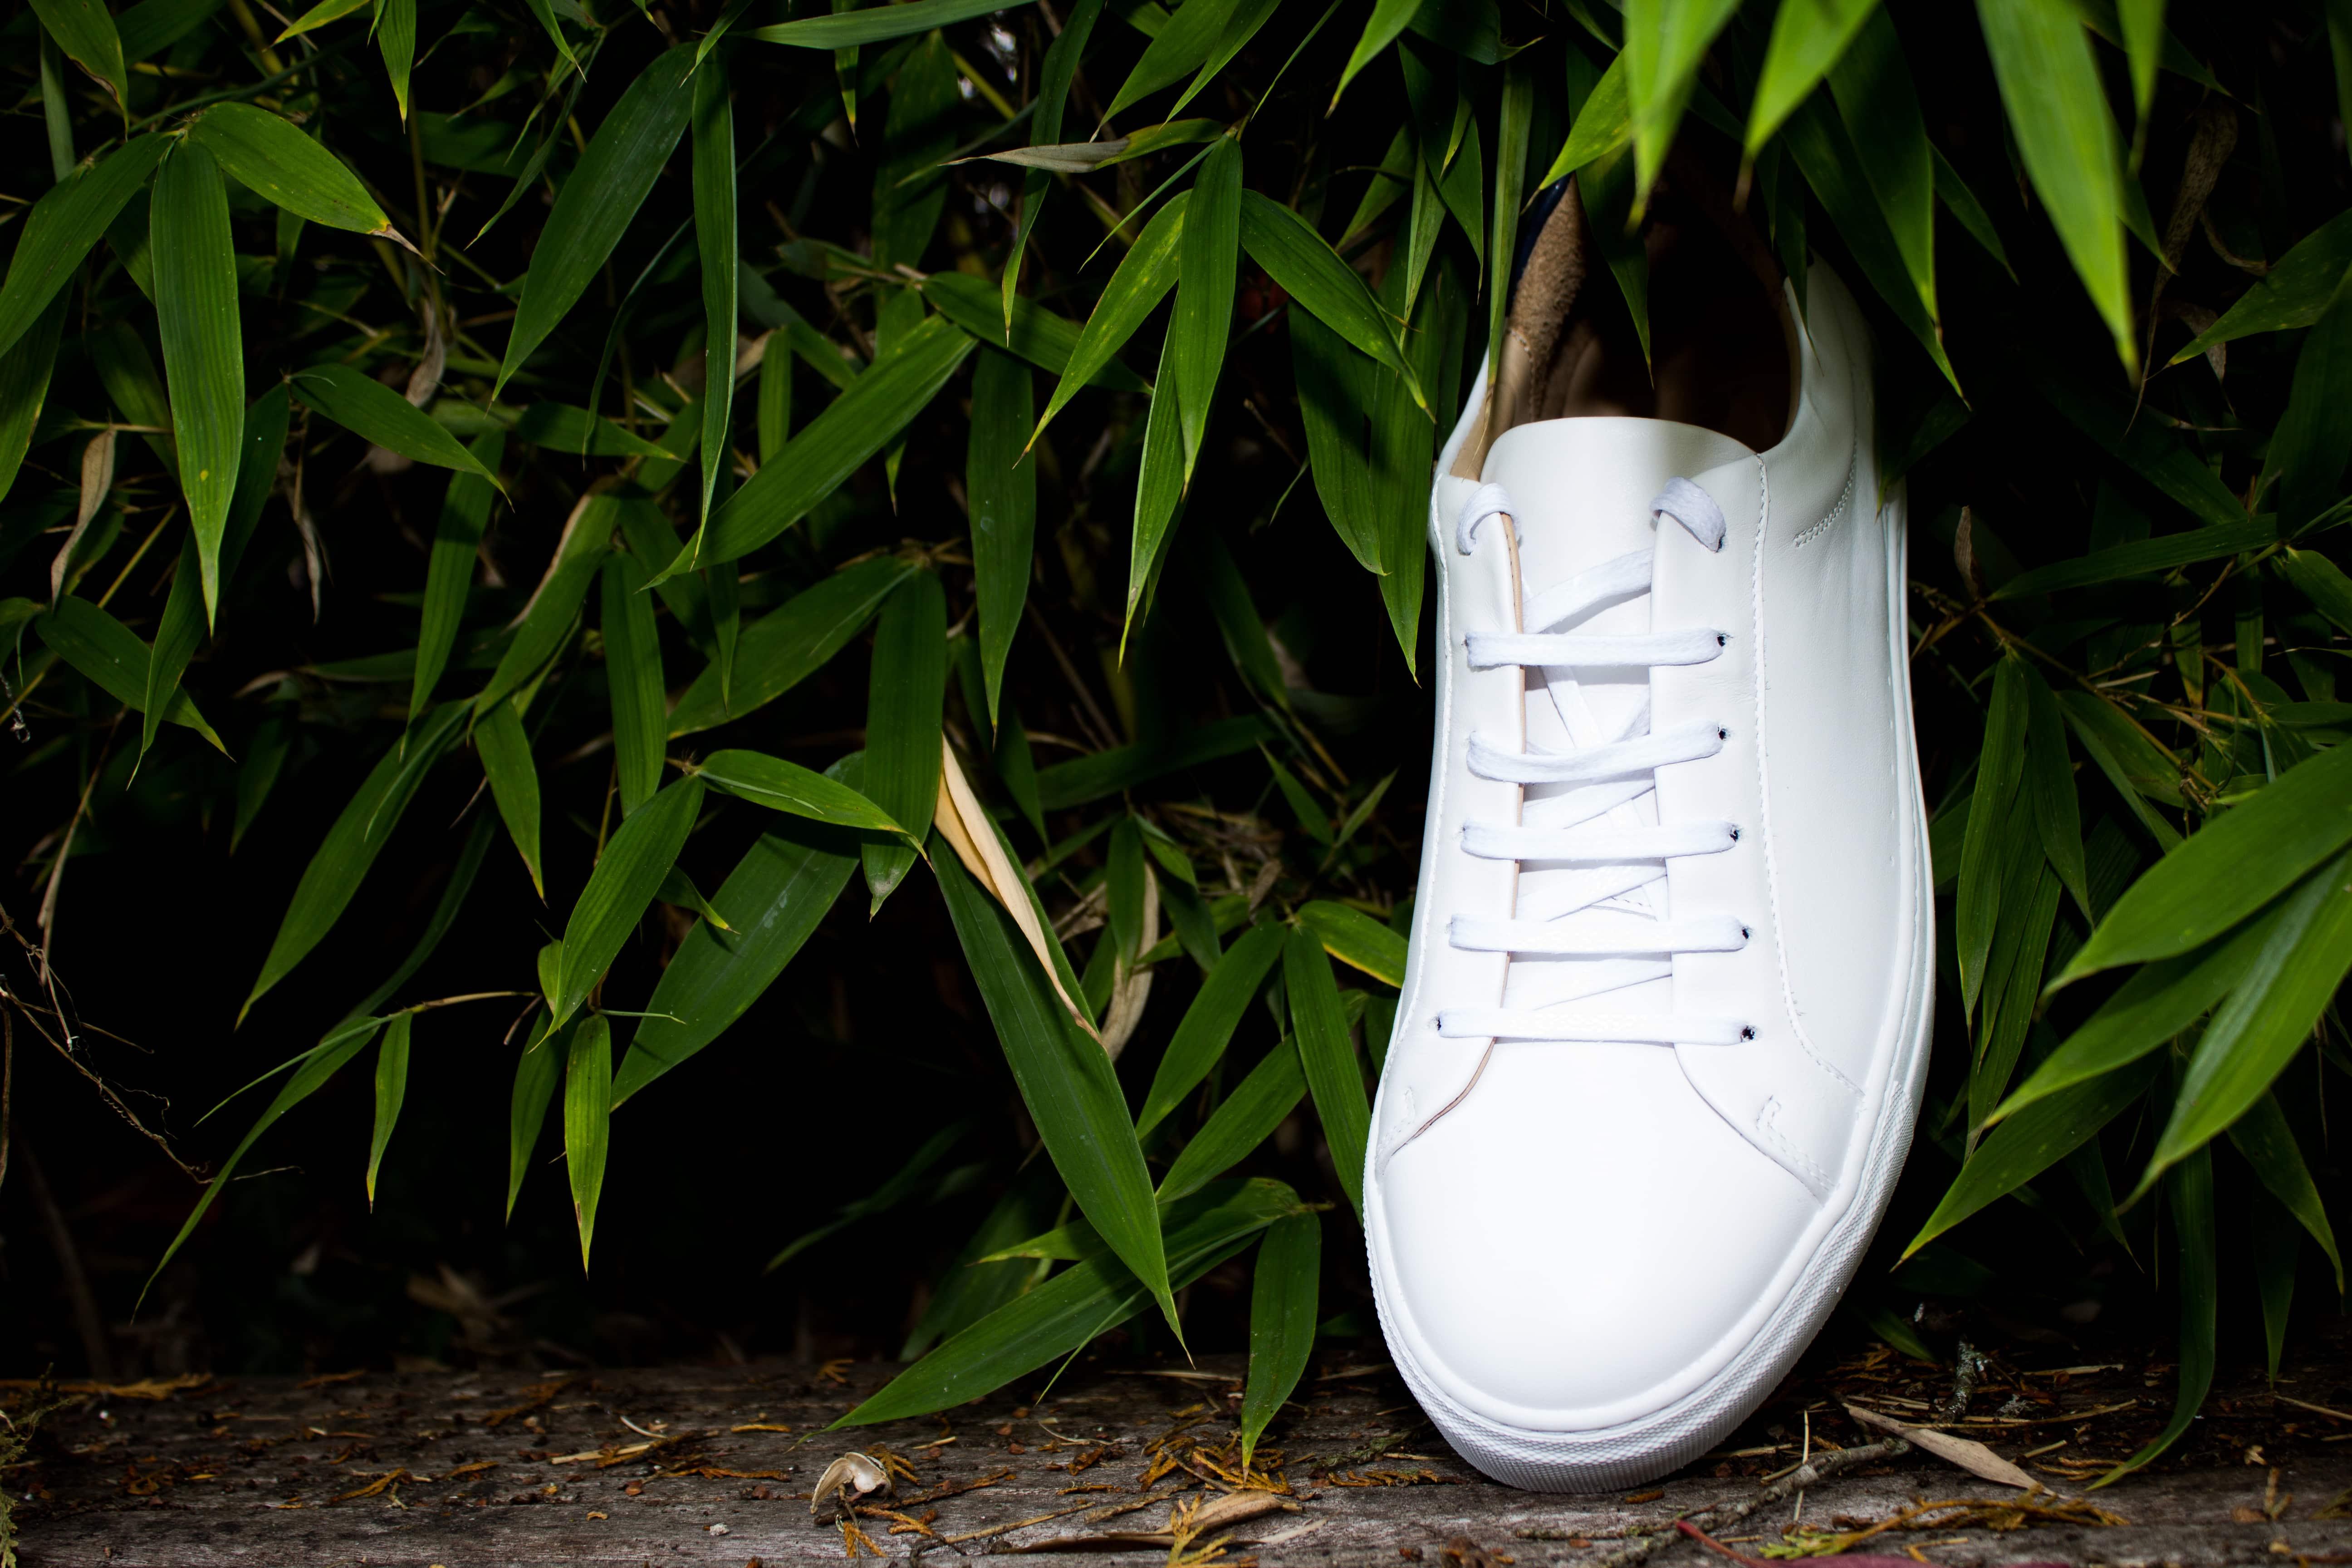 sneakers pied de biche forêt